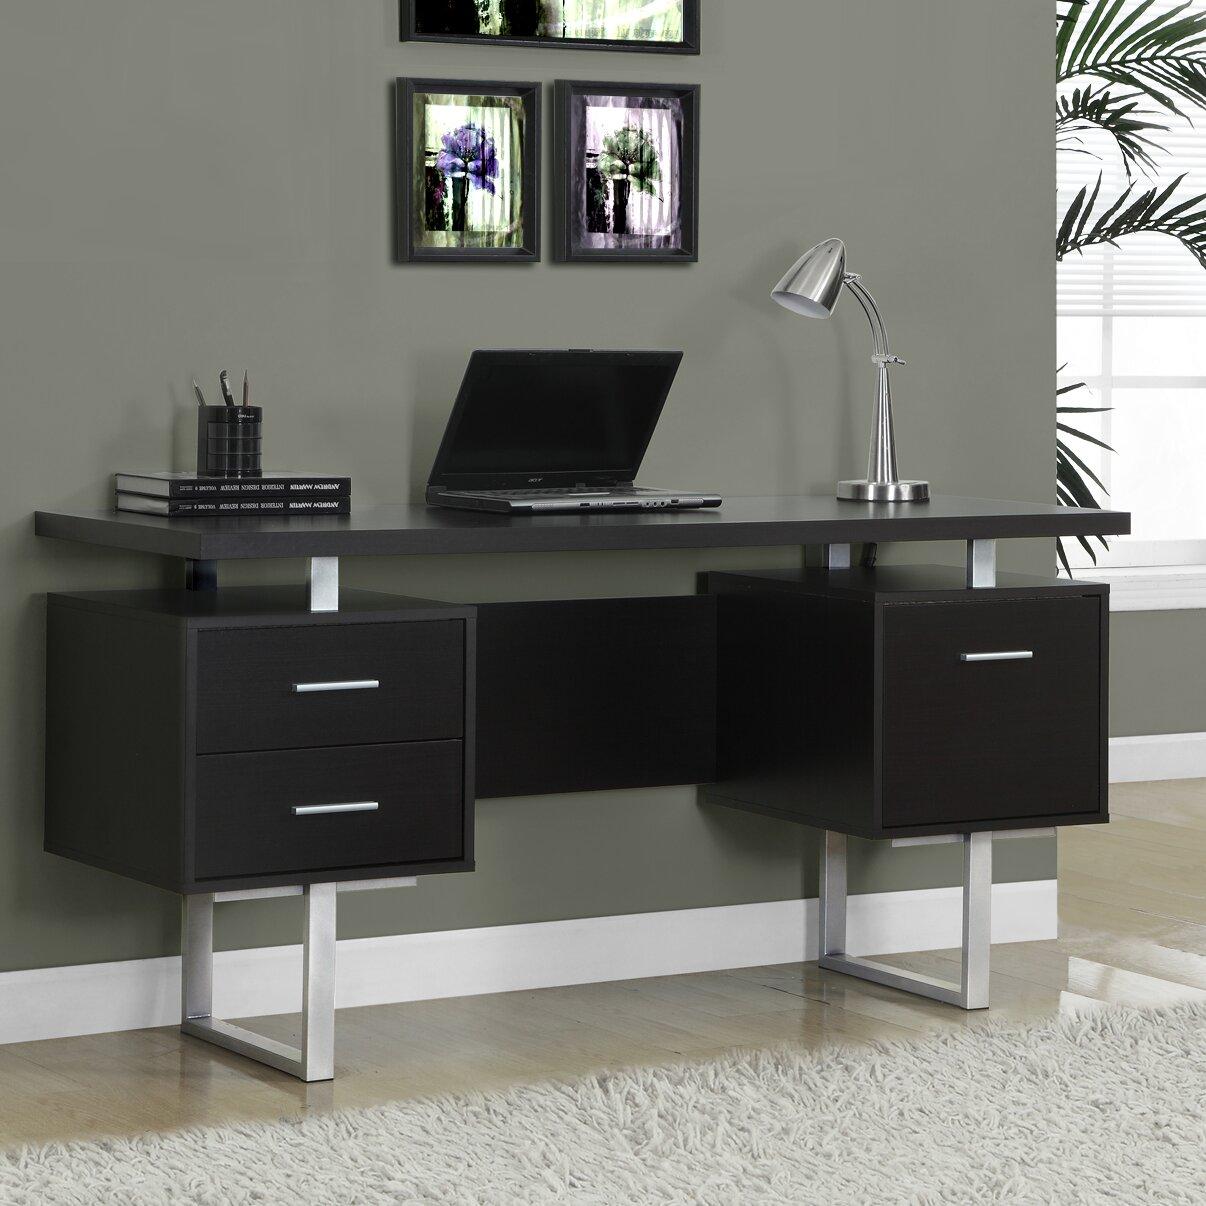 monarch specialties inc computer desk reviews wayfair. Black Bedroom Furniture Sets. Home Design Ideas